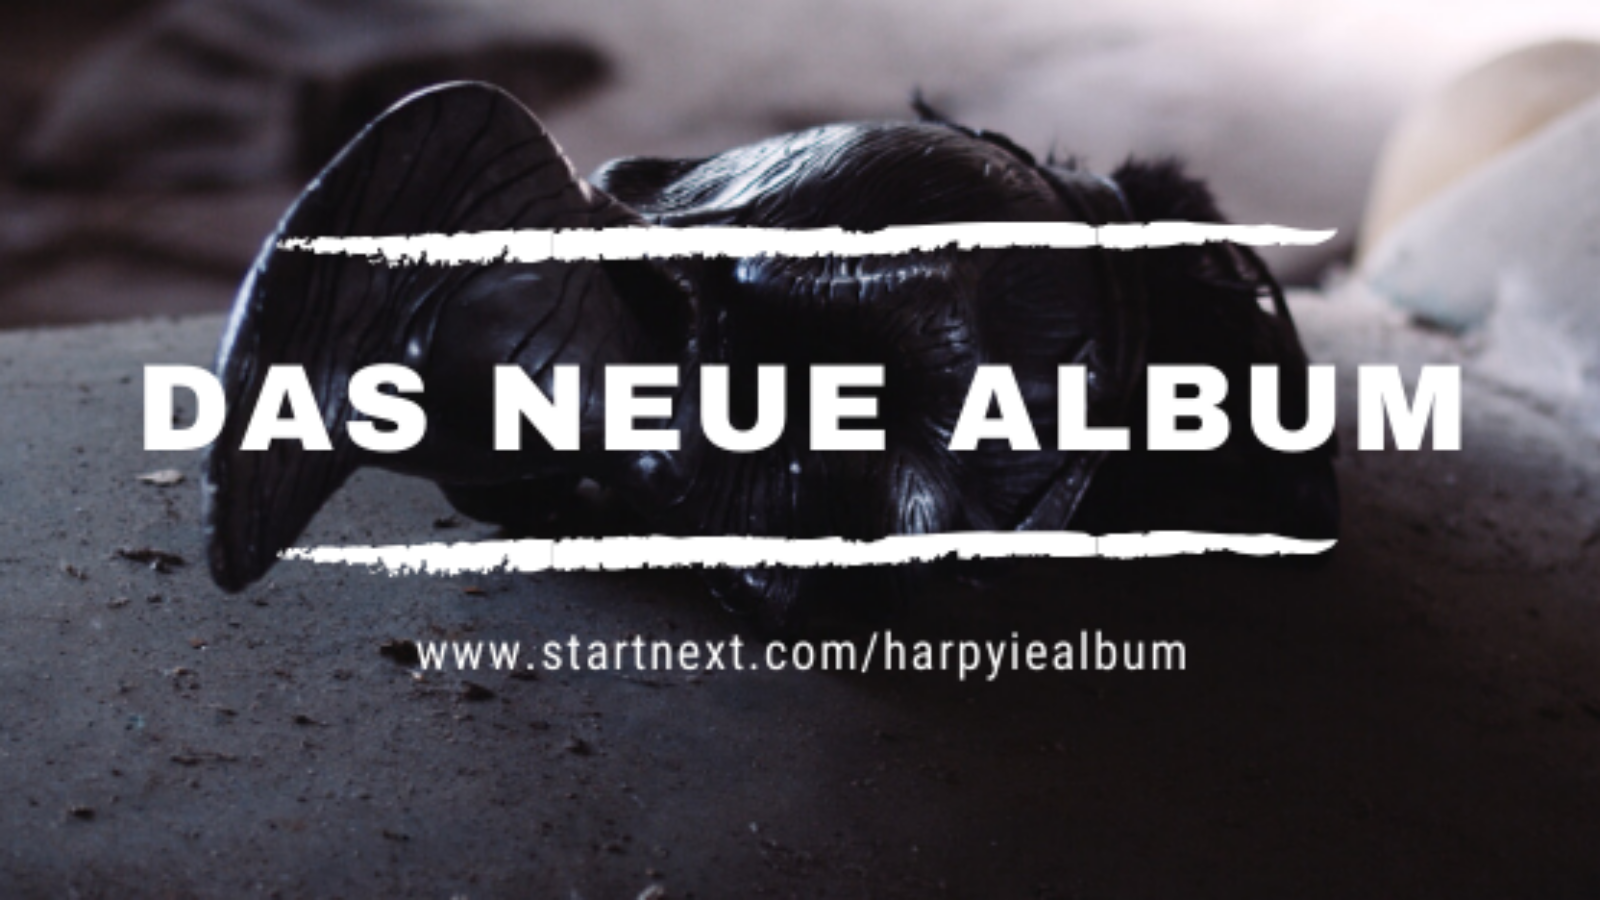 HARPYIE - Folk-Metal aus Ostwestfalen (jetzt bei StartNext)